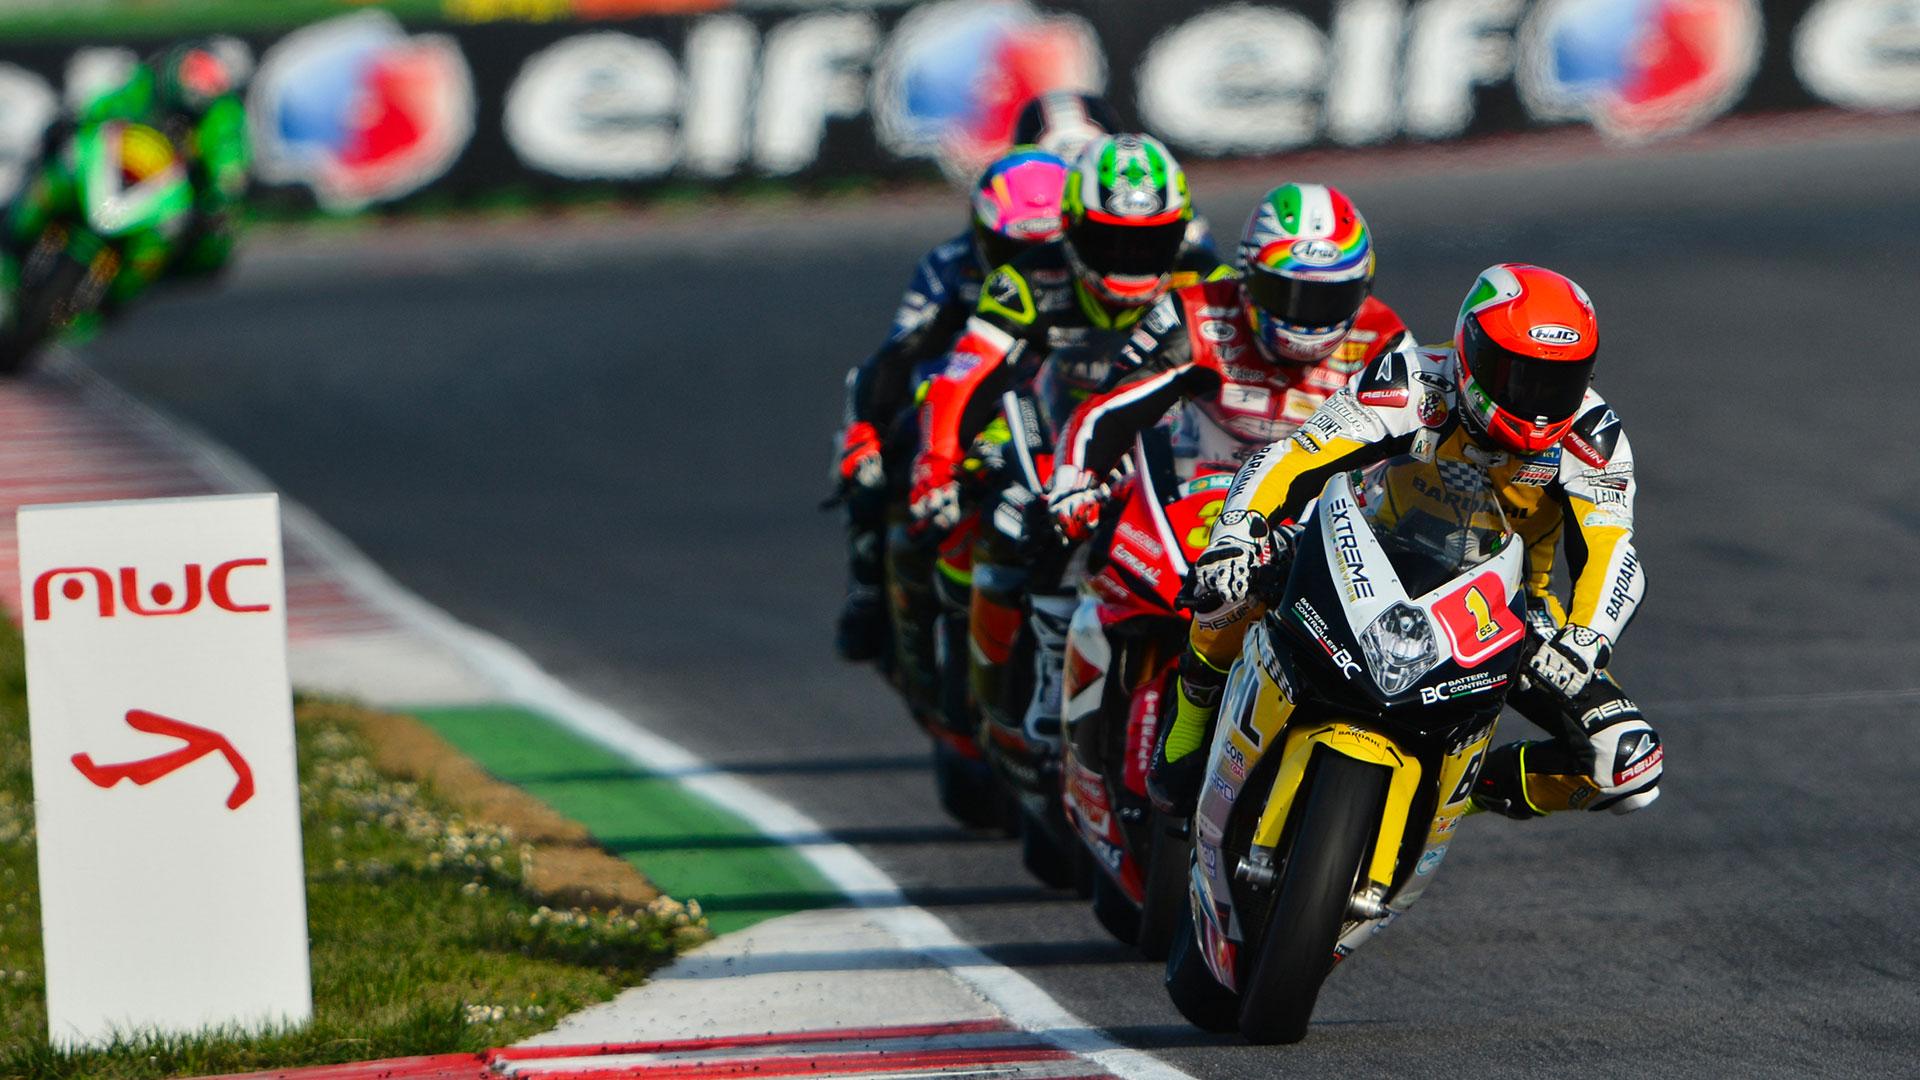 CIV Italian Speed Championship - Round 1 Misano